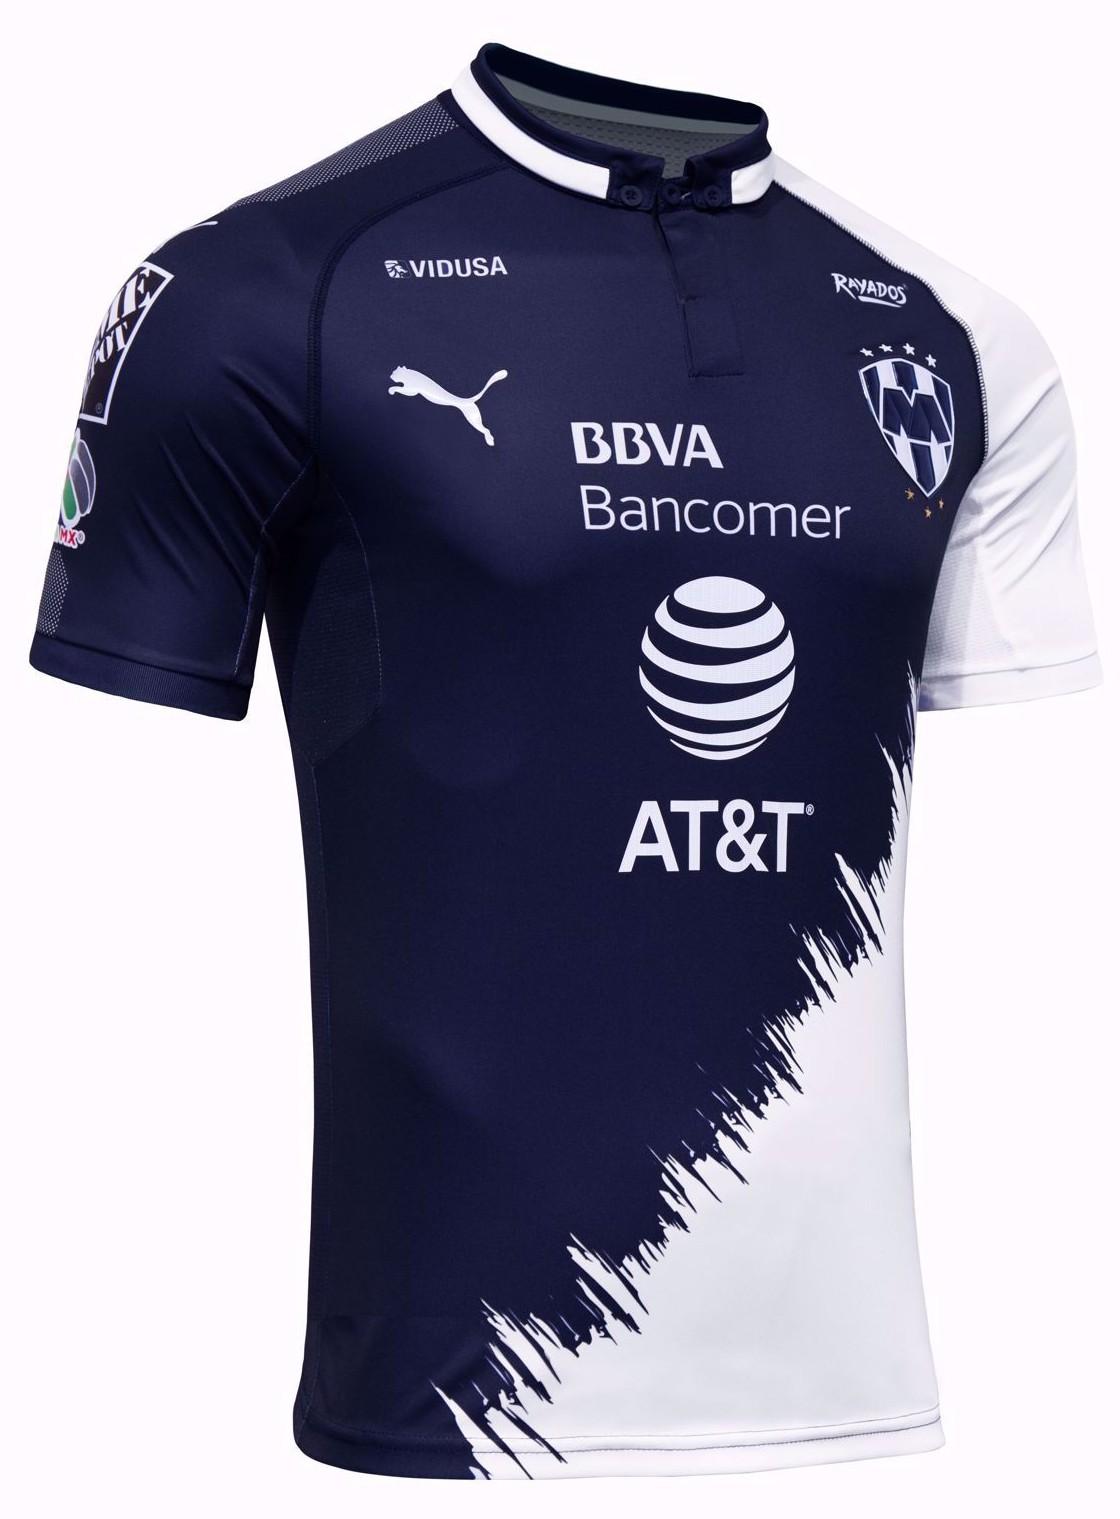 Rayados De Monterrey Jacket,Monterrey Mexico Soccer Team,Monterrey Third Away Soccer Jersey 2018-2019